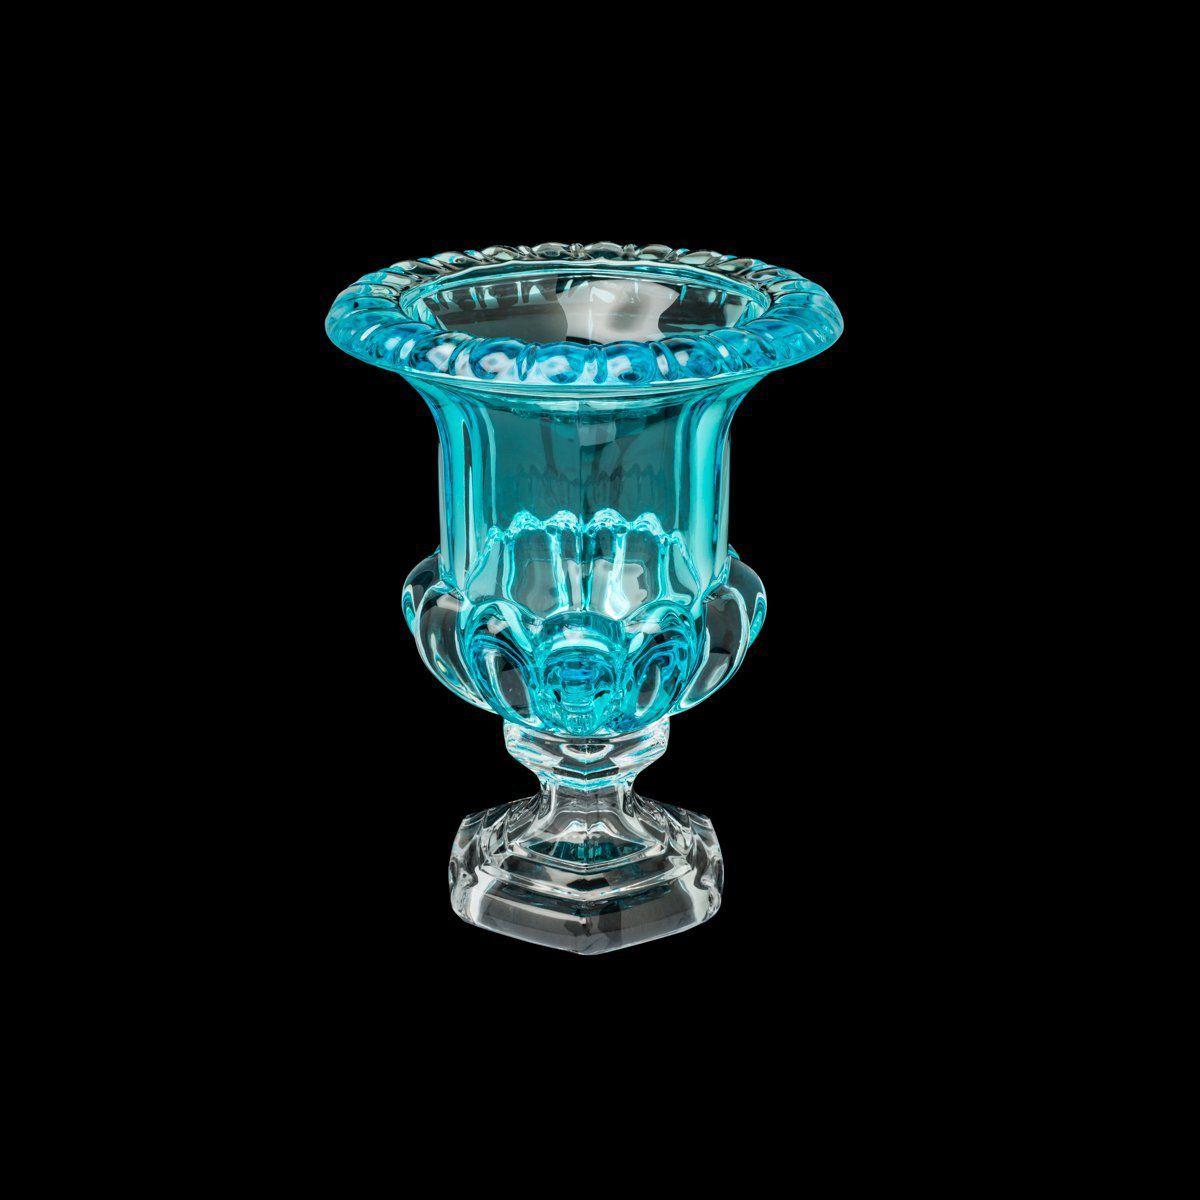 Vaso decorativo 25,5 cm de cristal turquesa com pé Sussex Wolff - 26459